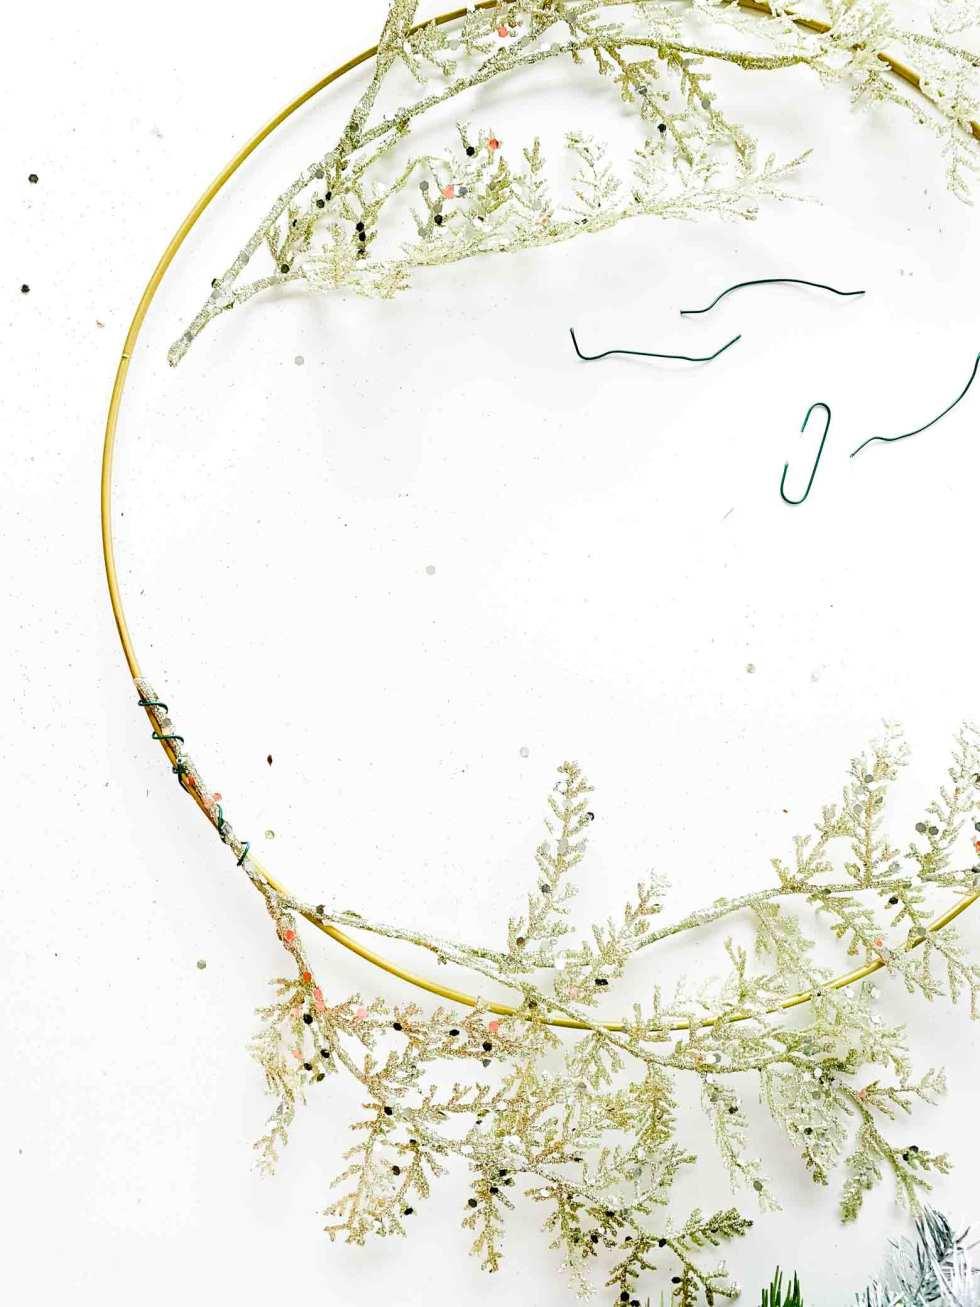 wiring a floral stem onto a metal wreath hoop